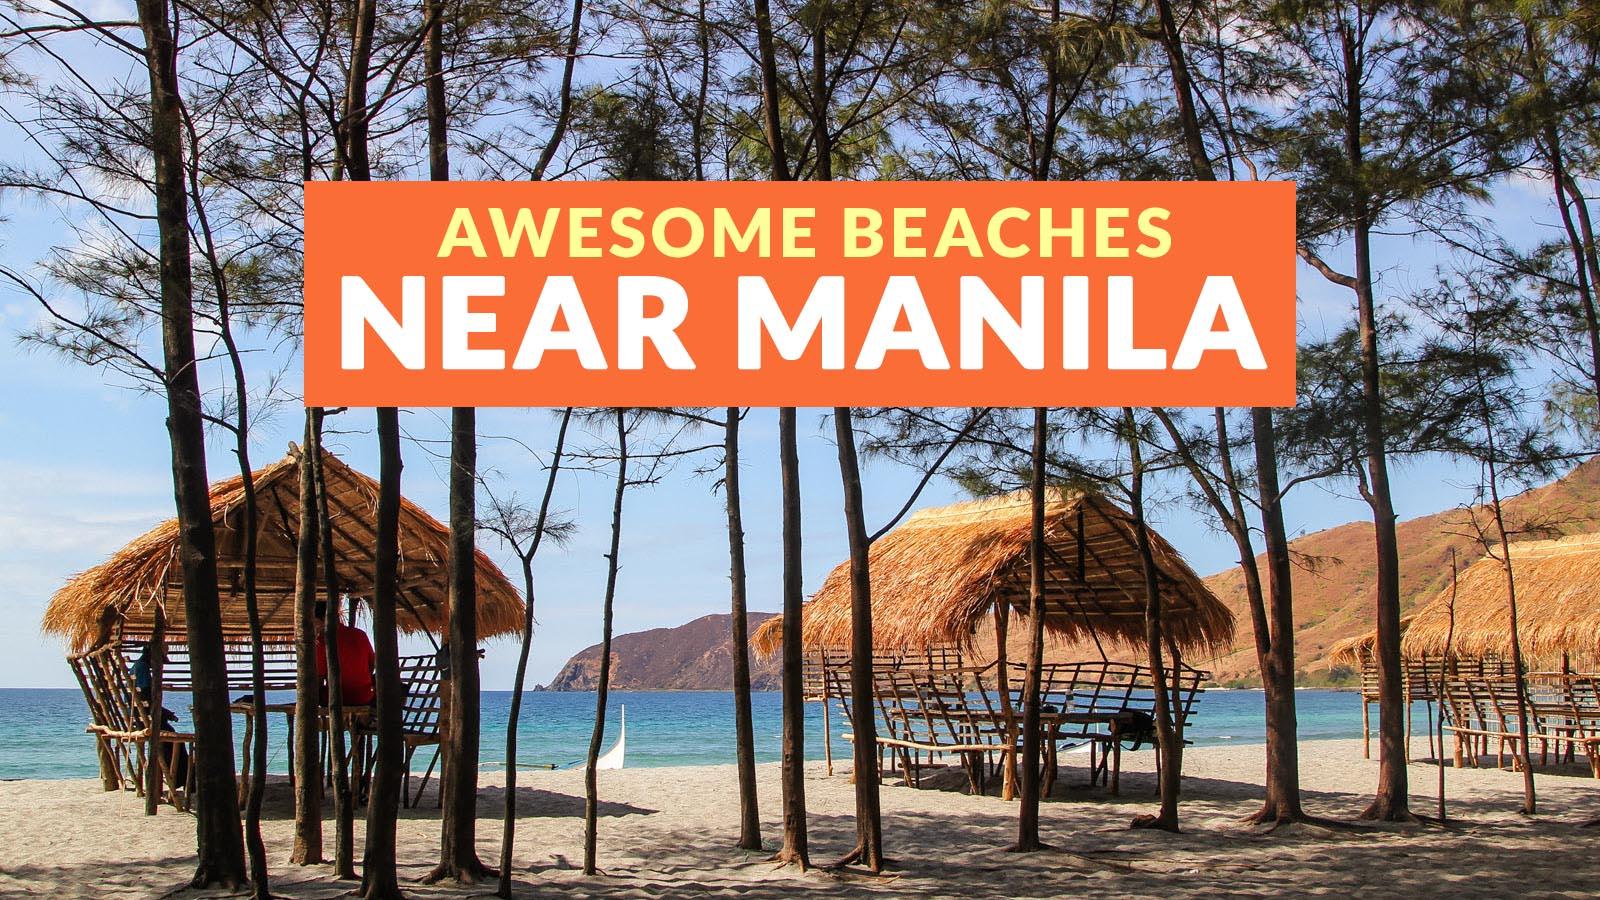 Beach Resorts Near Manila For Team Building